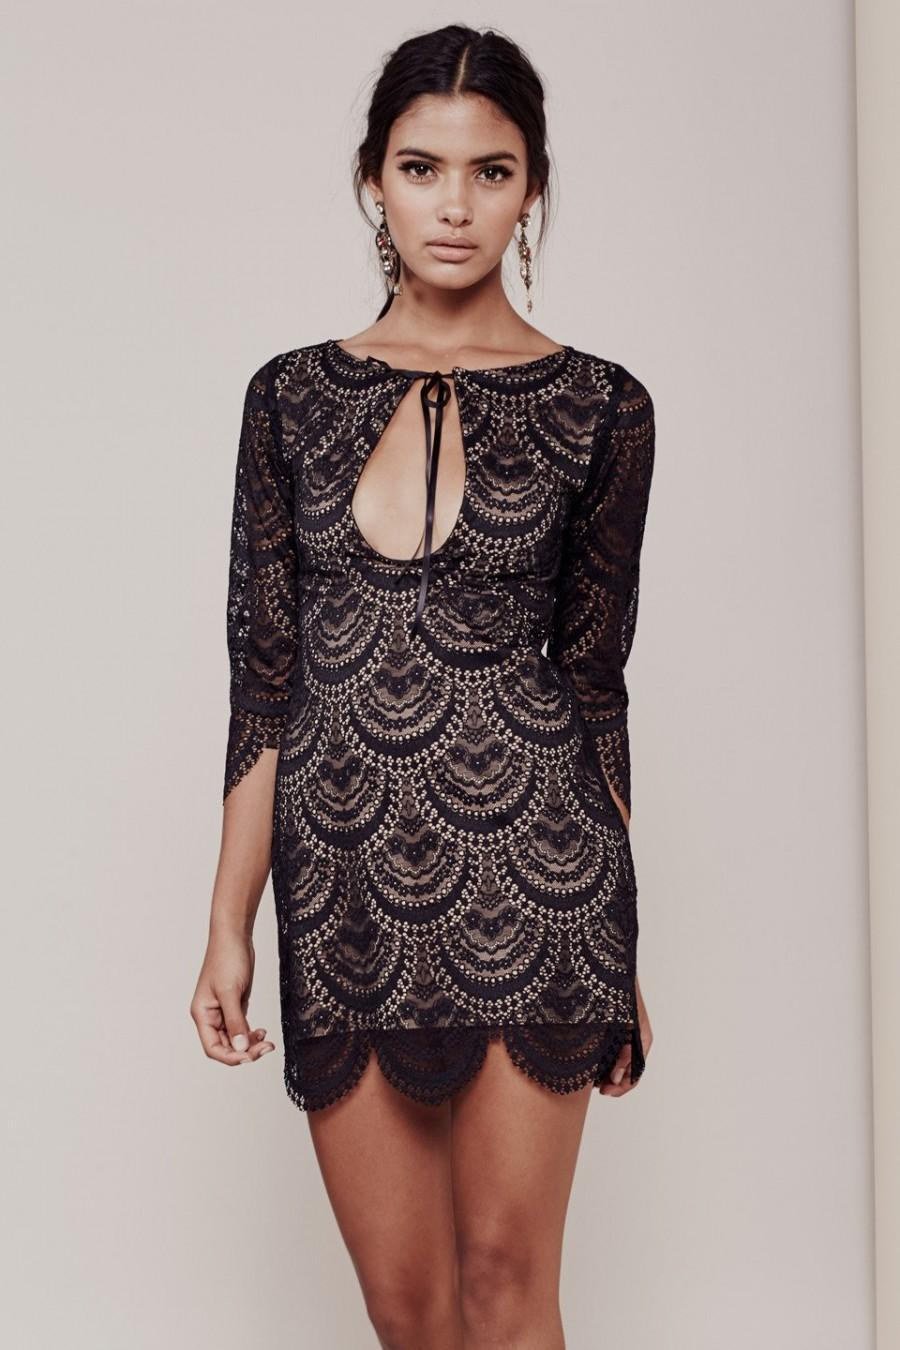 d37fb06fe6bd9 FOR LOVE & LEMONS ROSALITA MINI DRESS IN BLACK #2589019 - Weddbook